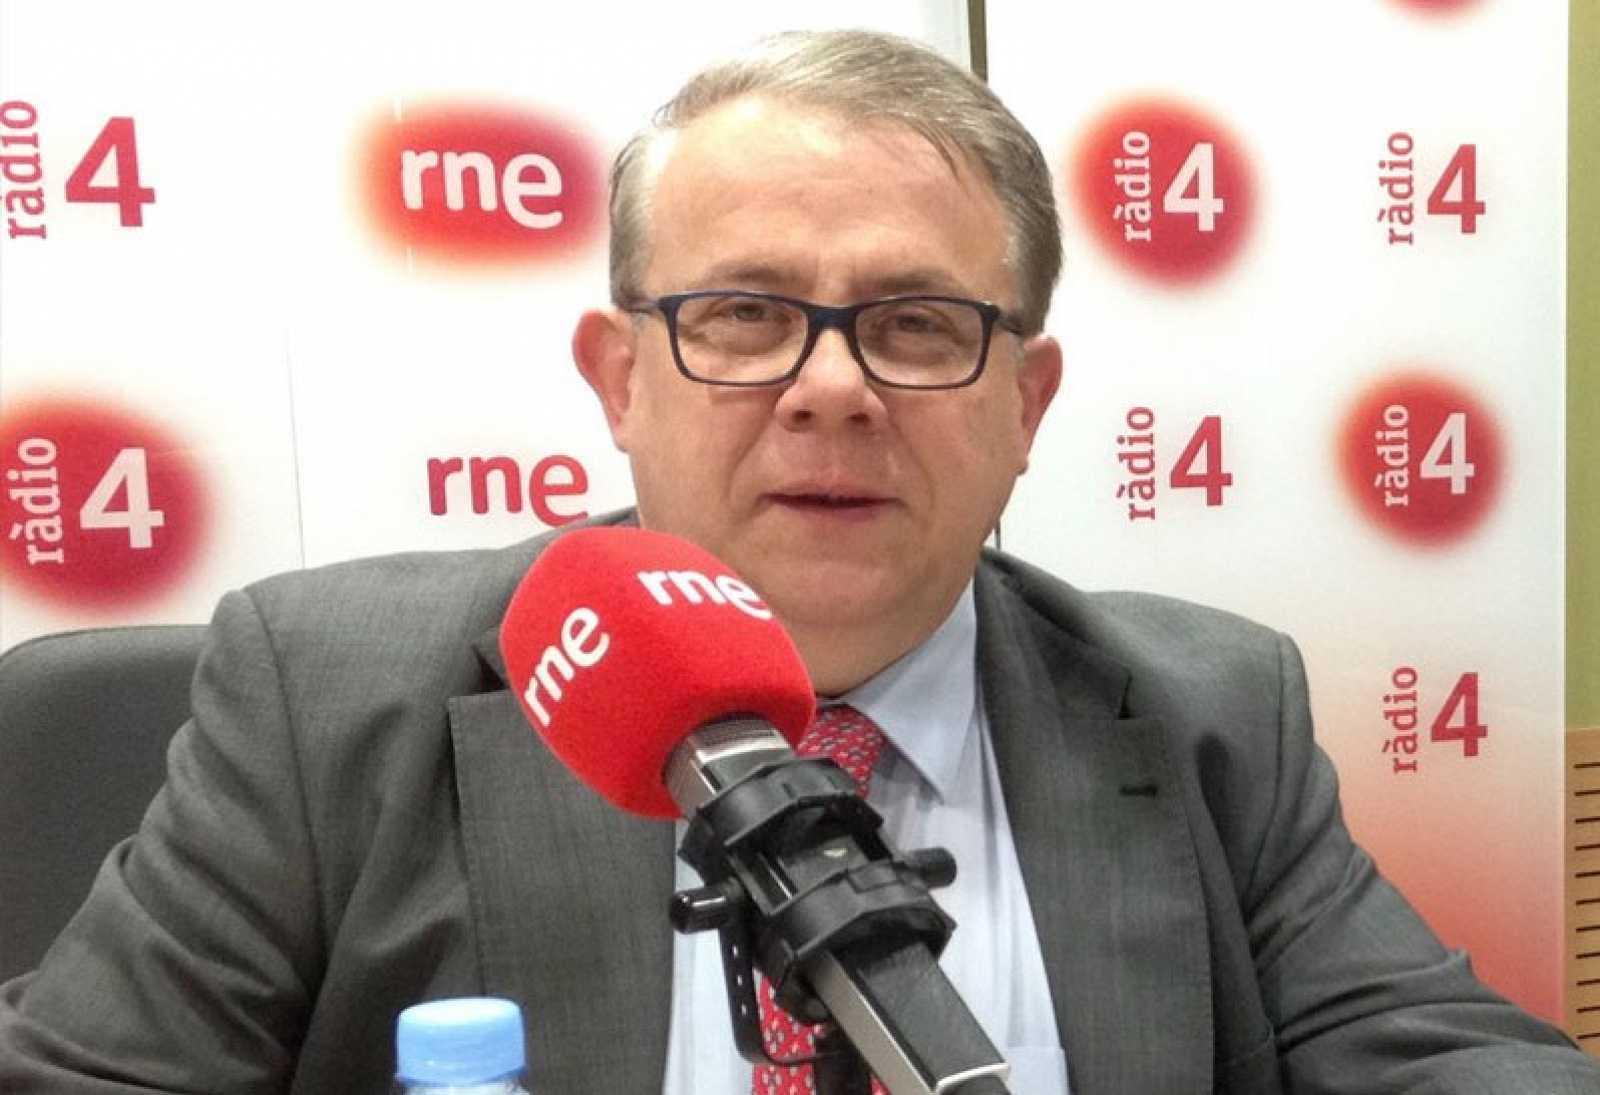 De boca a orella - Entrevista a Jaume Padrós